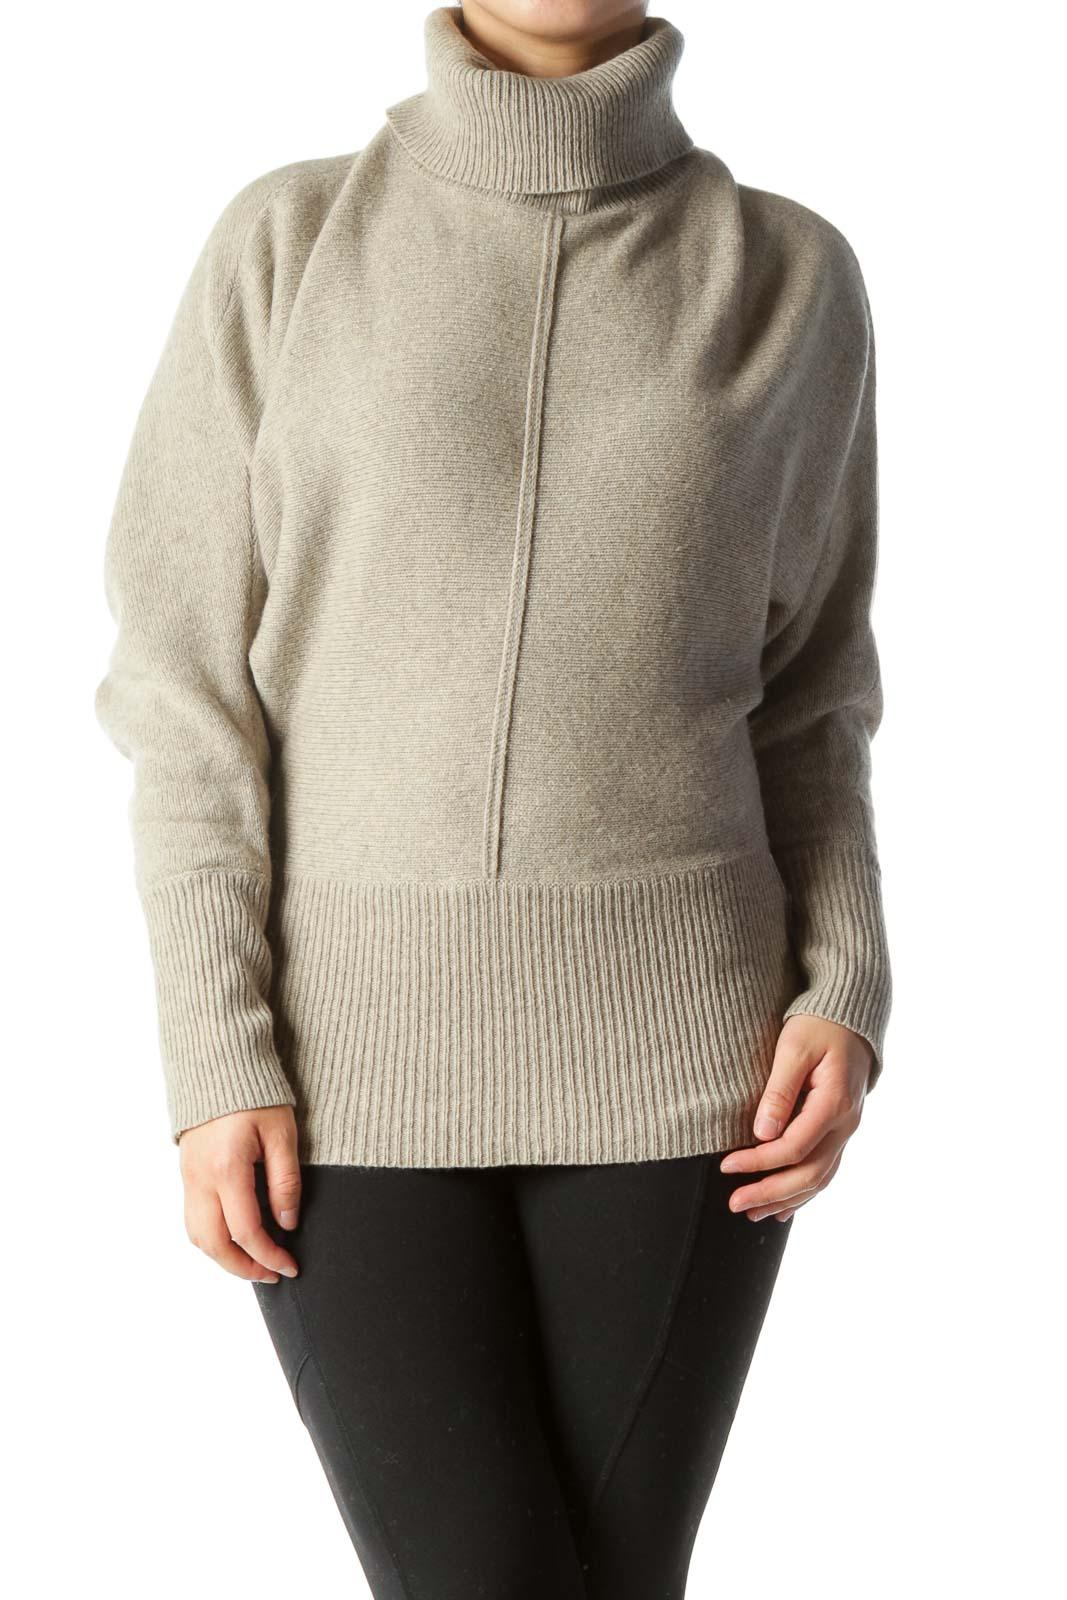 Beige Gray Turtle Neck Bat-Sleeve Slim-Waist Knit Sweater